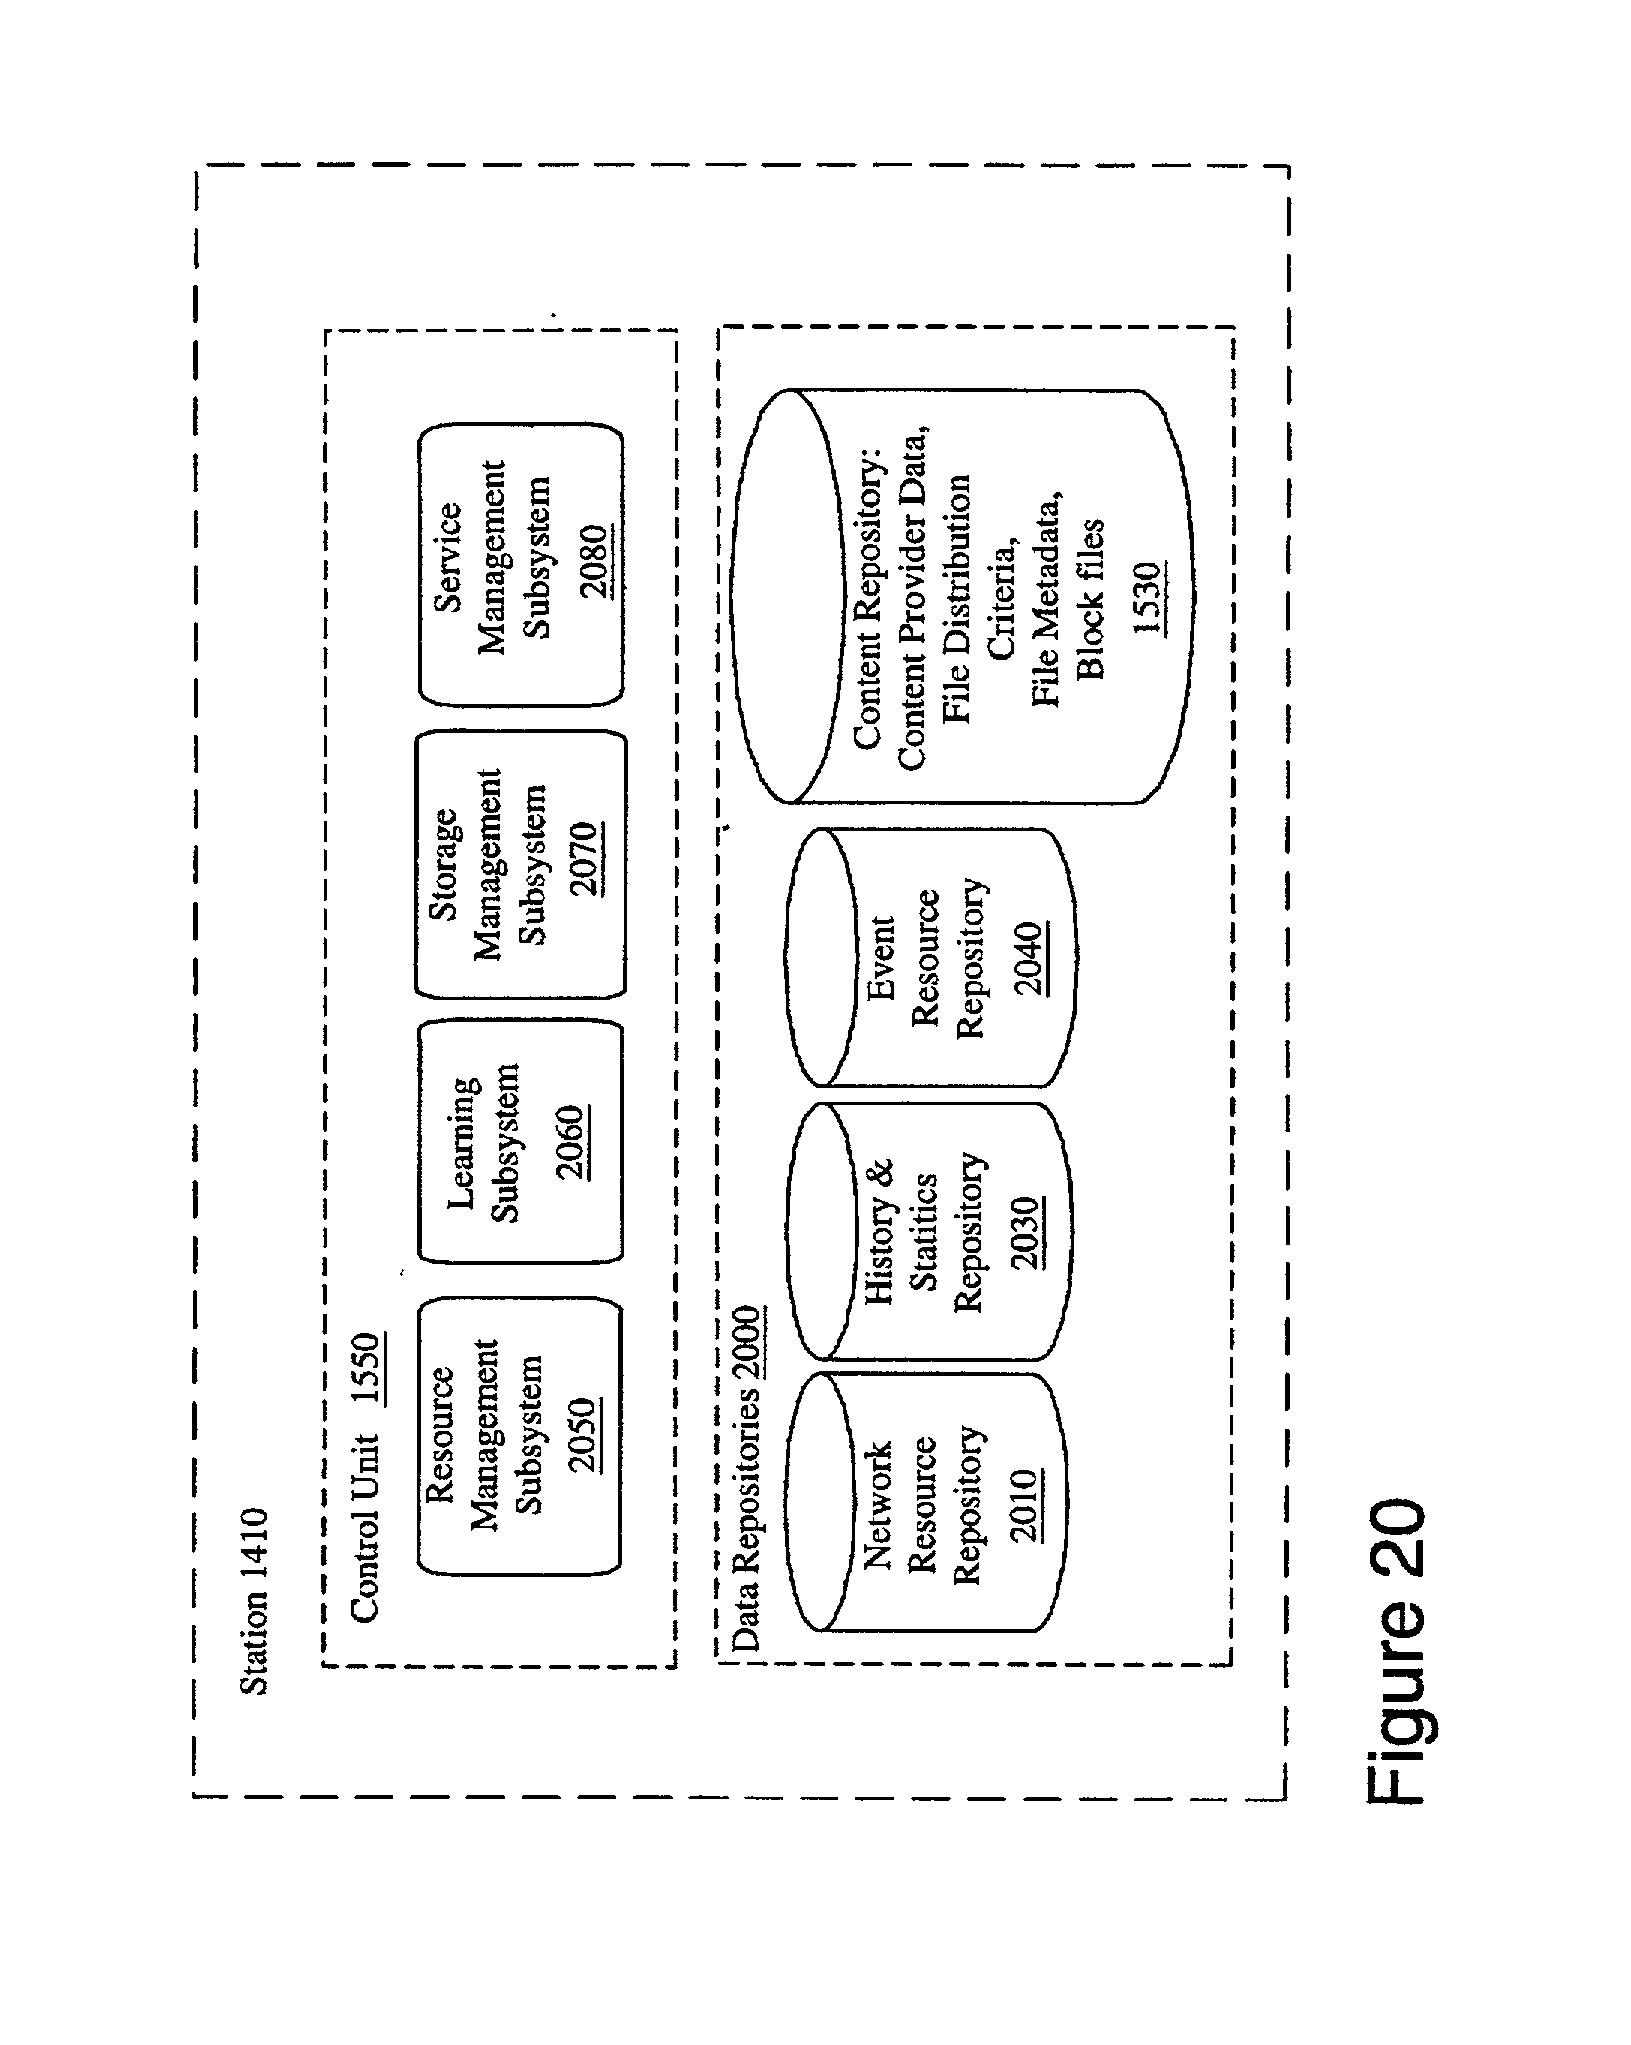 Patent US 20020078174A1